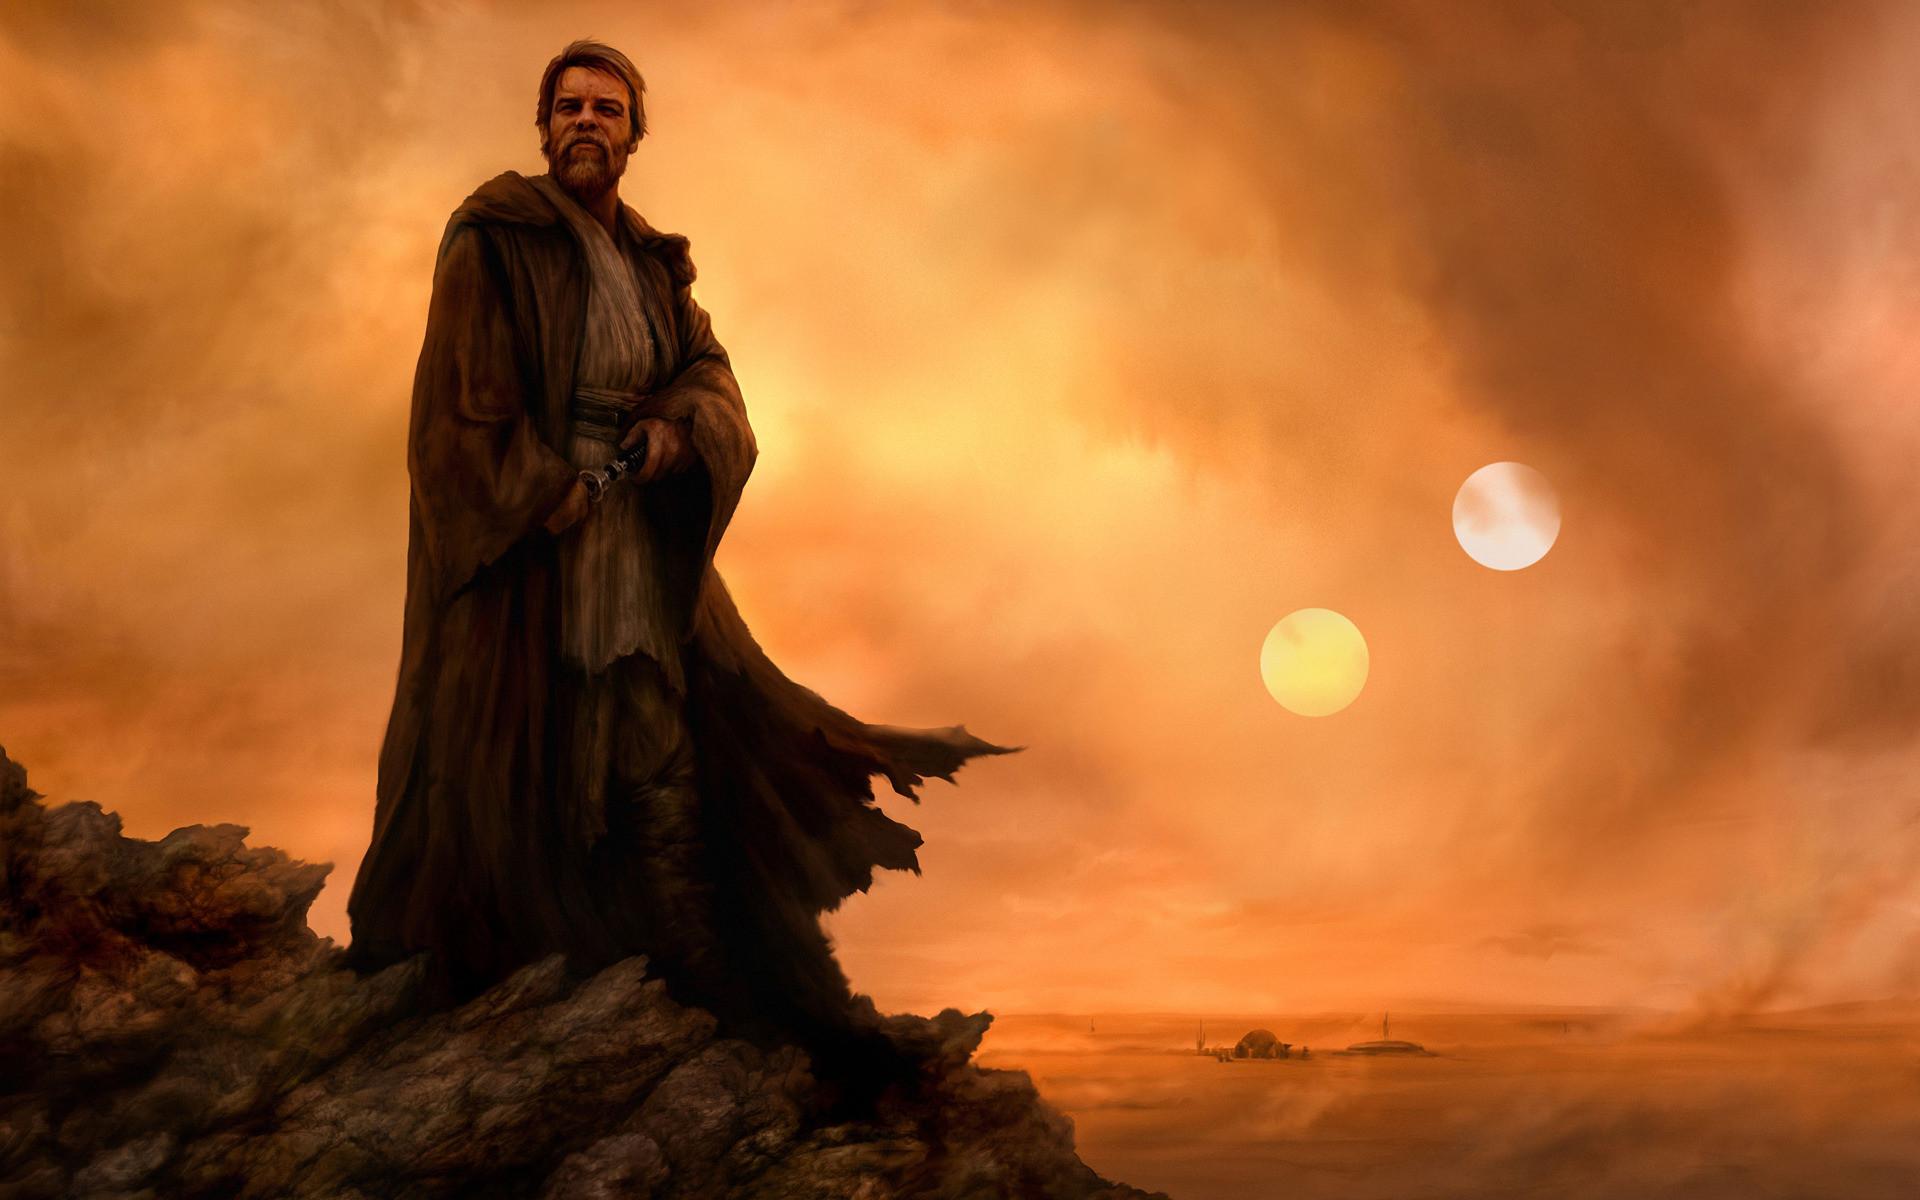 Obi-Wan Kenobi – Star Wars wallpaper #17694